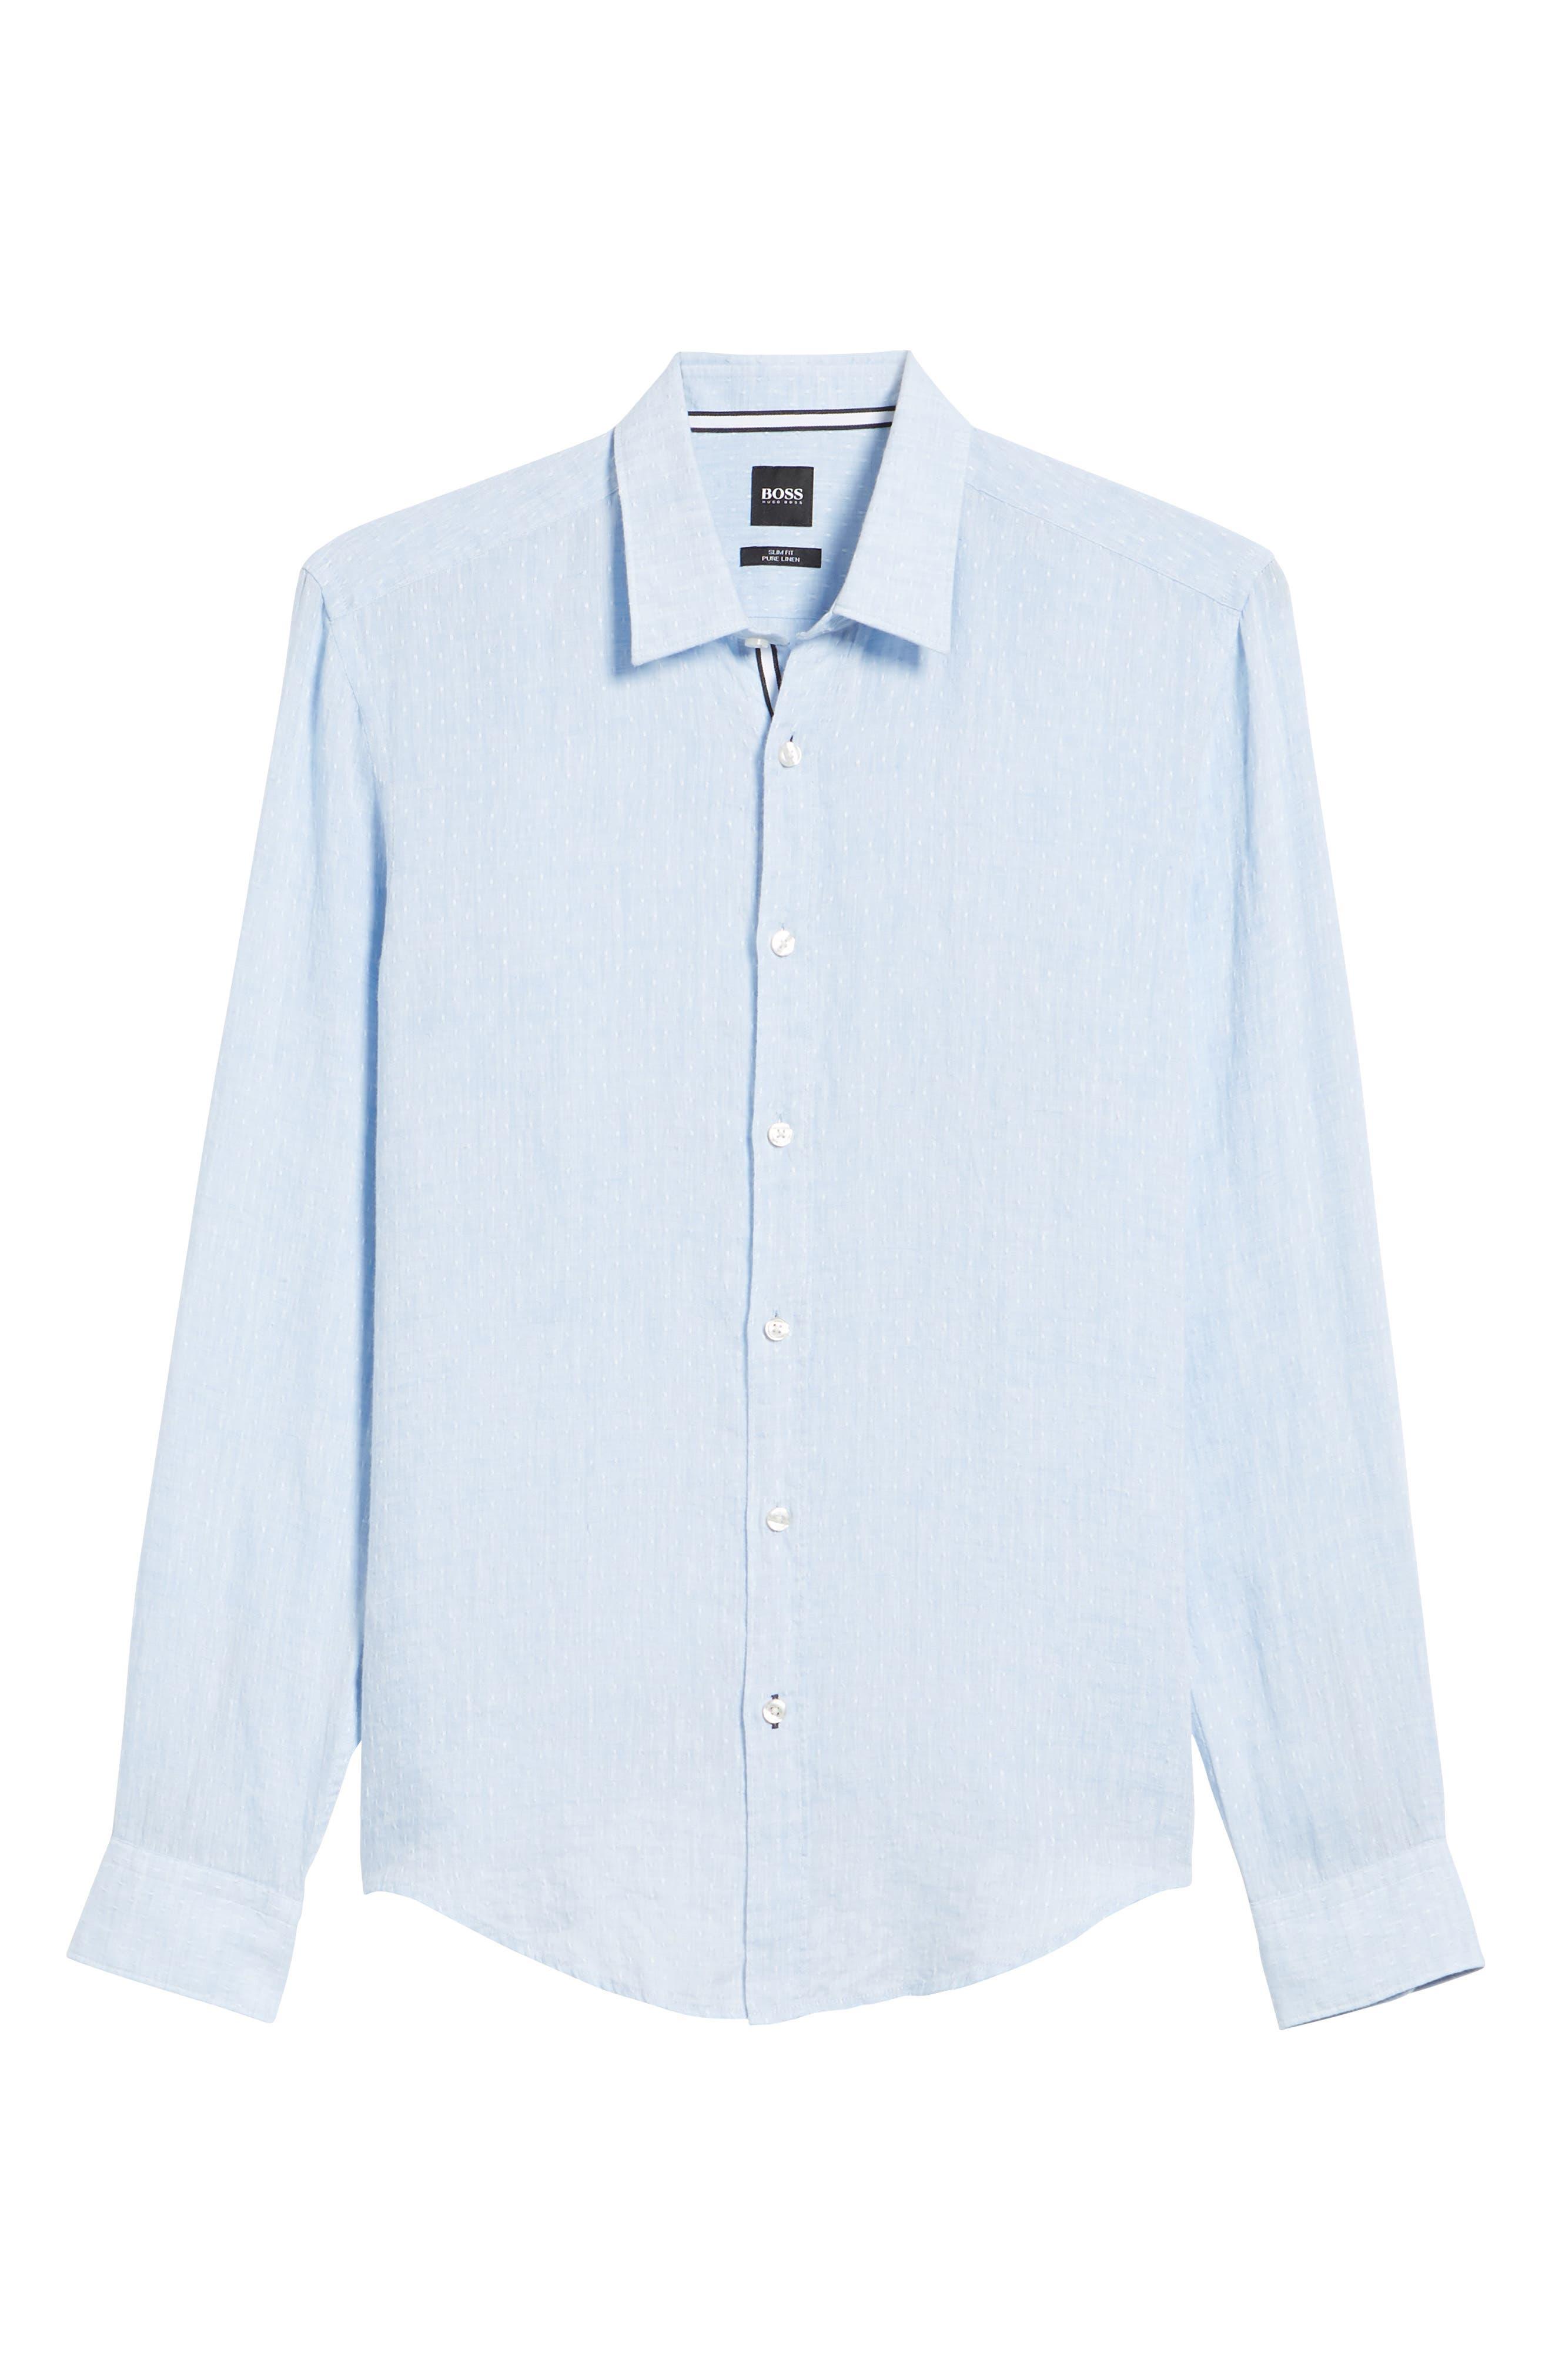 Ronni Slim Fit Dobby Linen Sport Shirt,                             Alternate thumbnail 12, color,